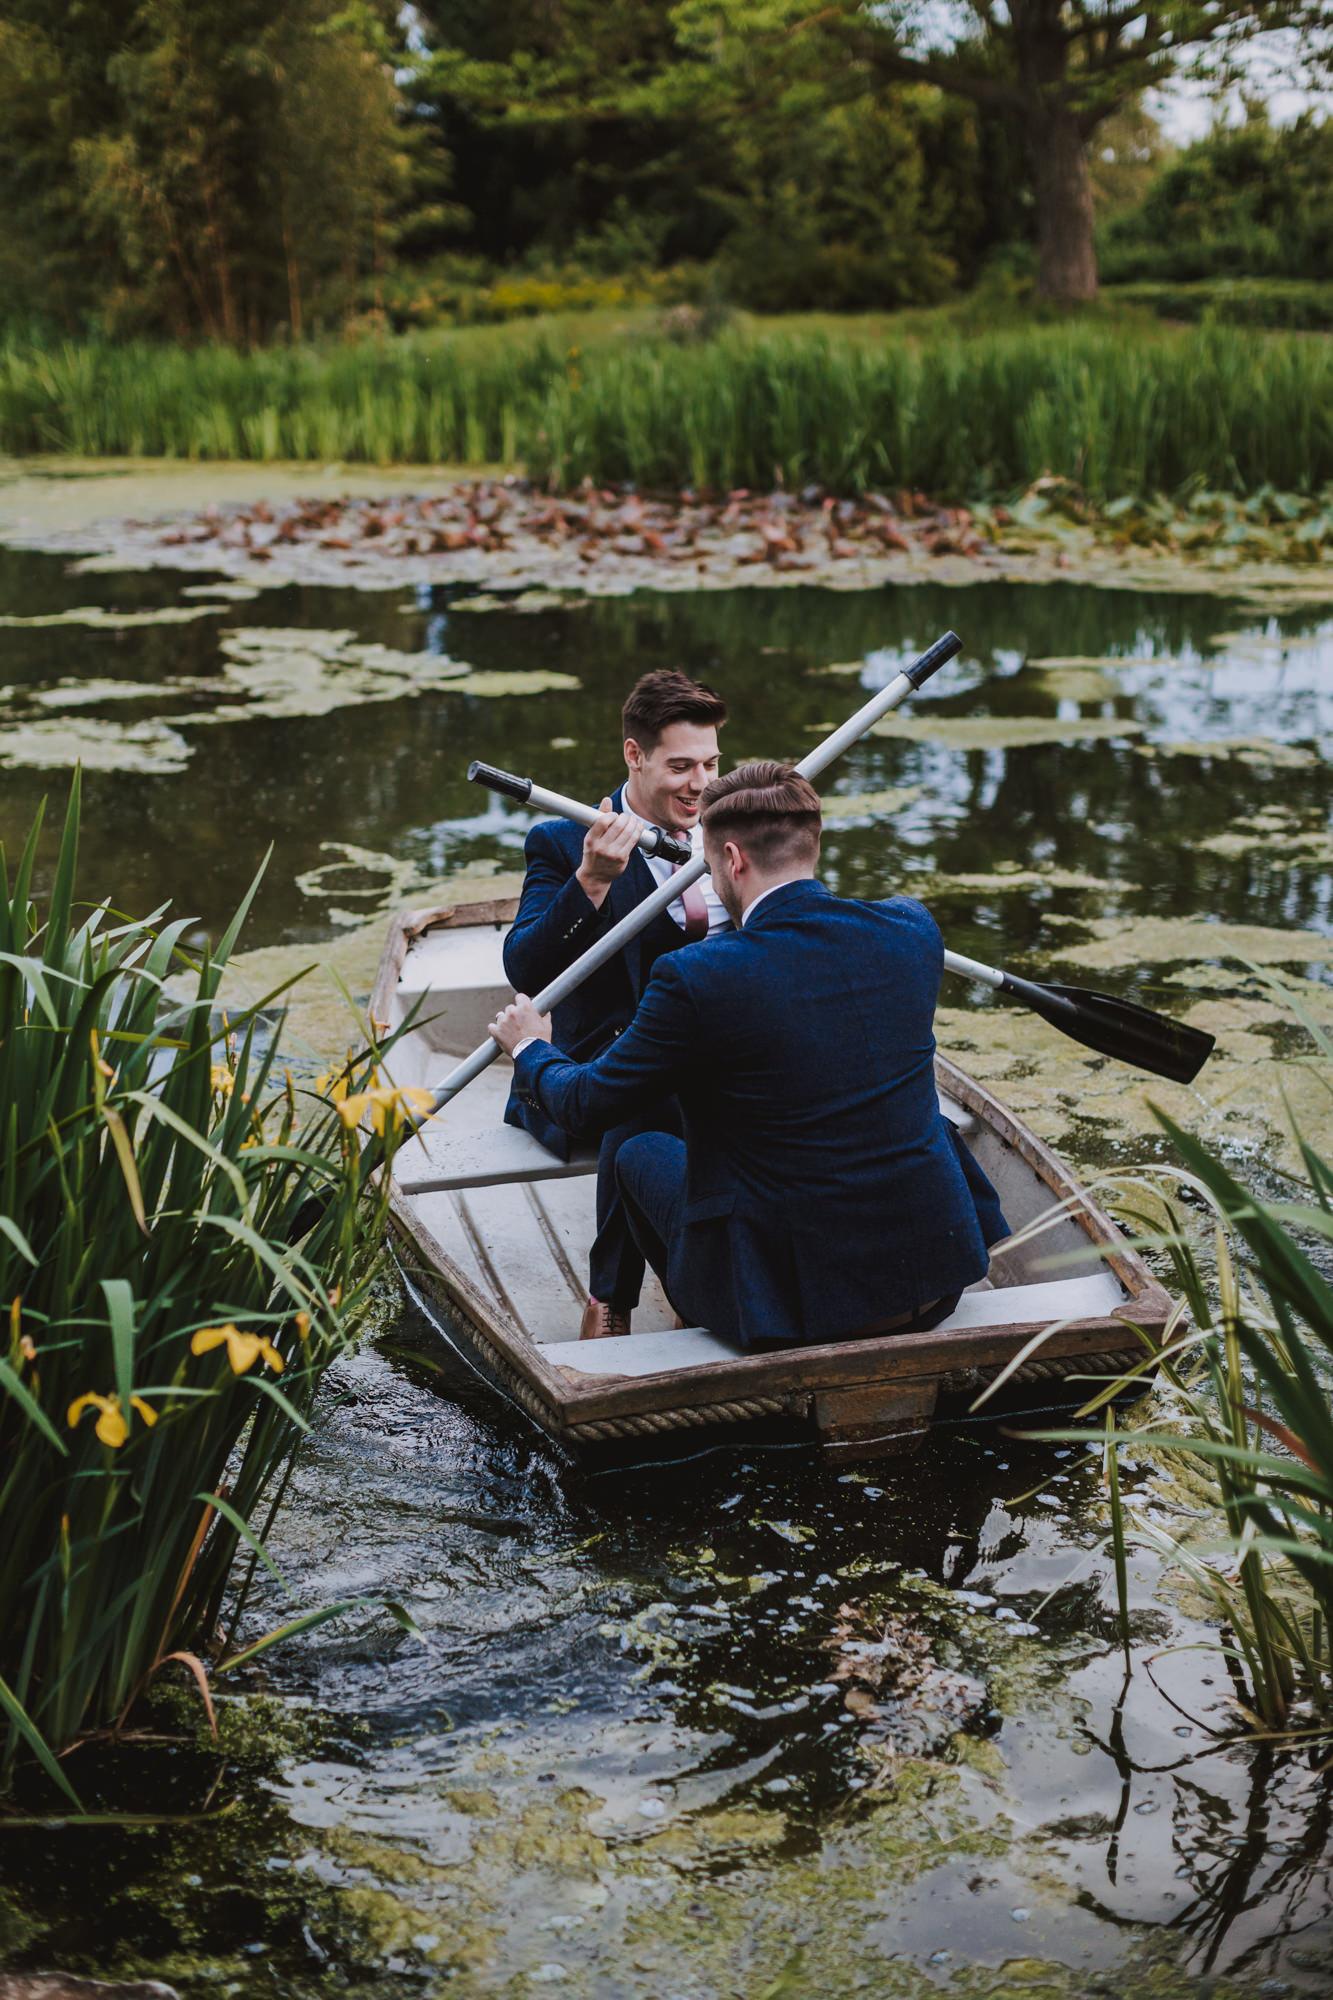 hodsock priory wedding photographers blog96.jpg